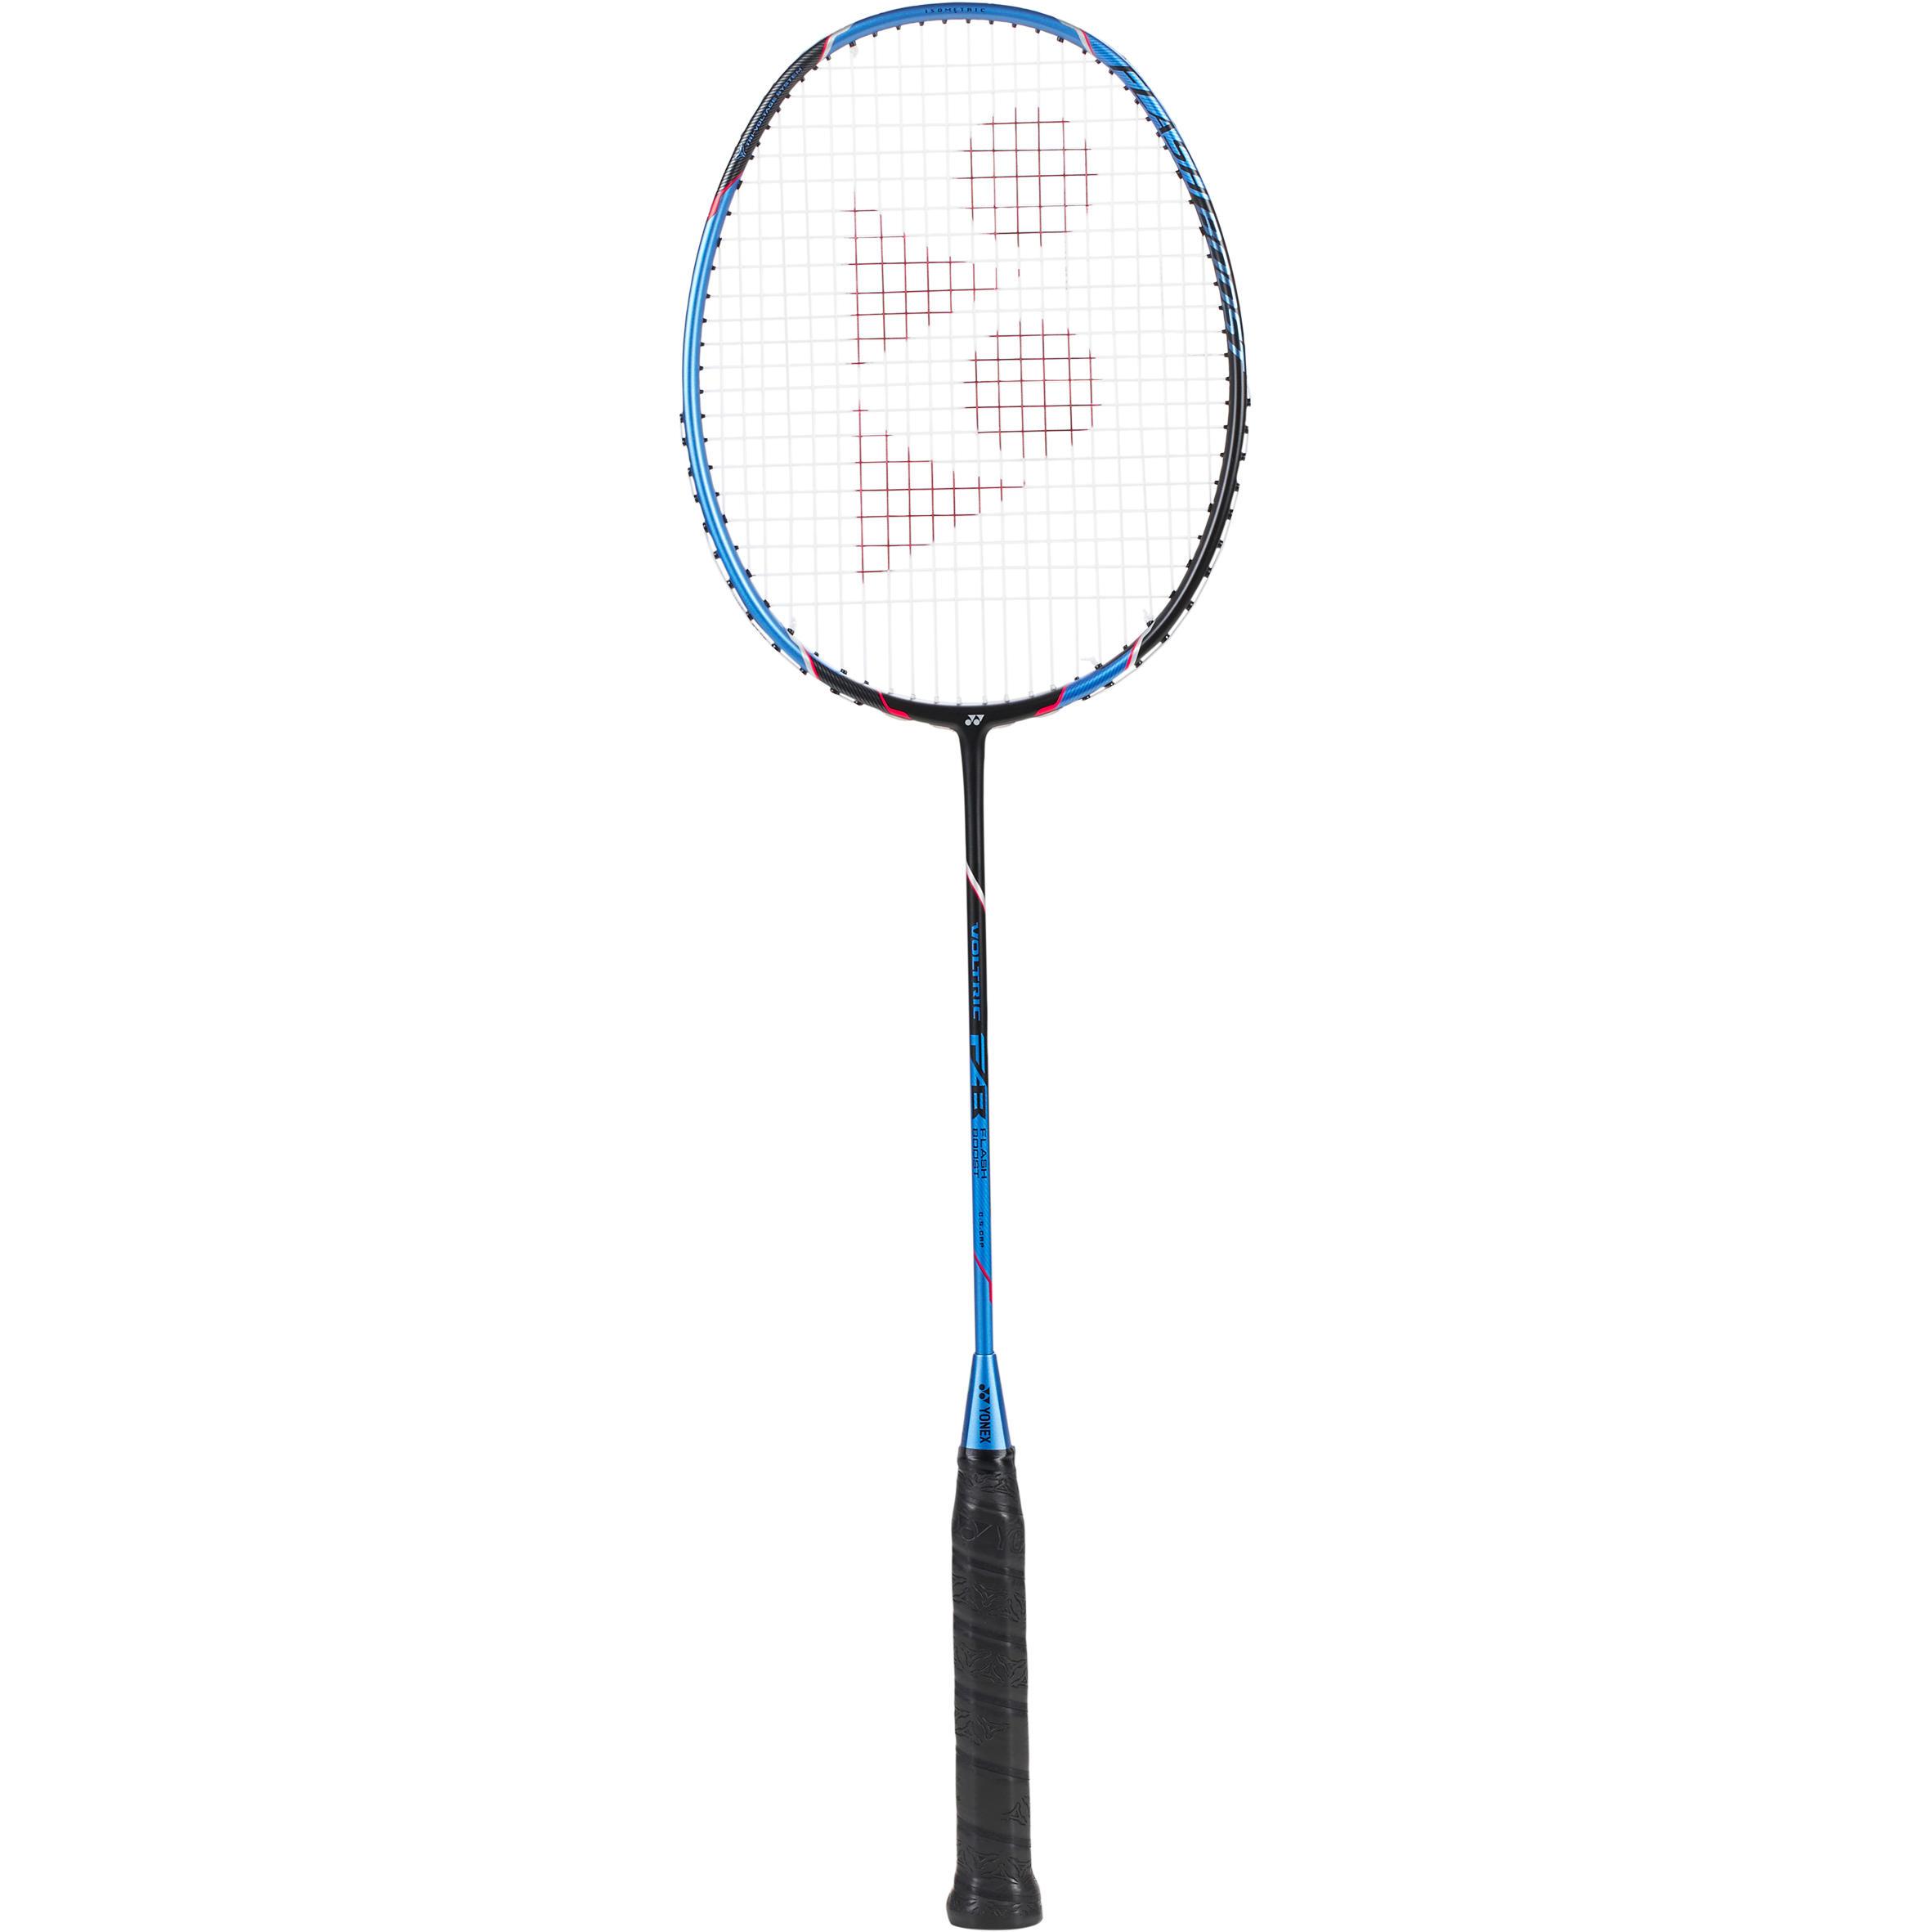 Yonex Badmintonracket Yonex Voltric Flash Boost